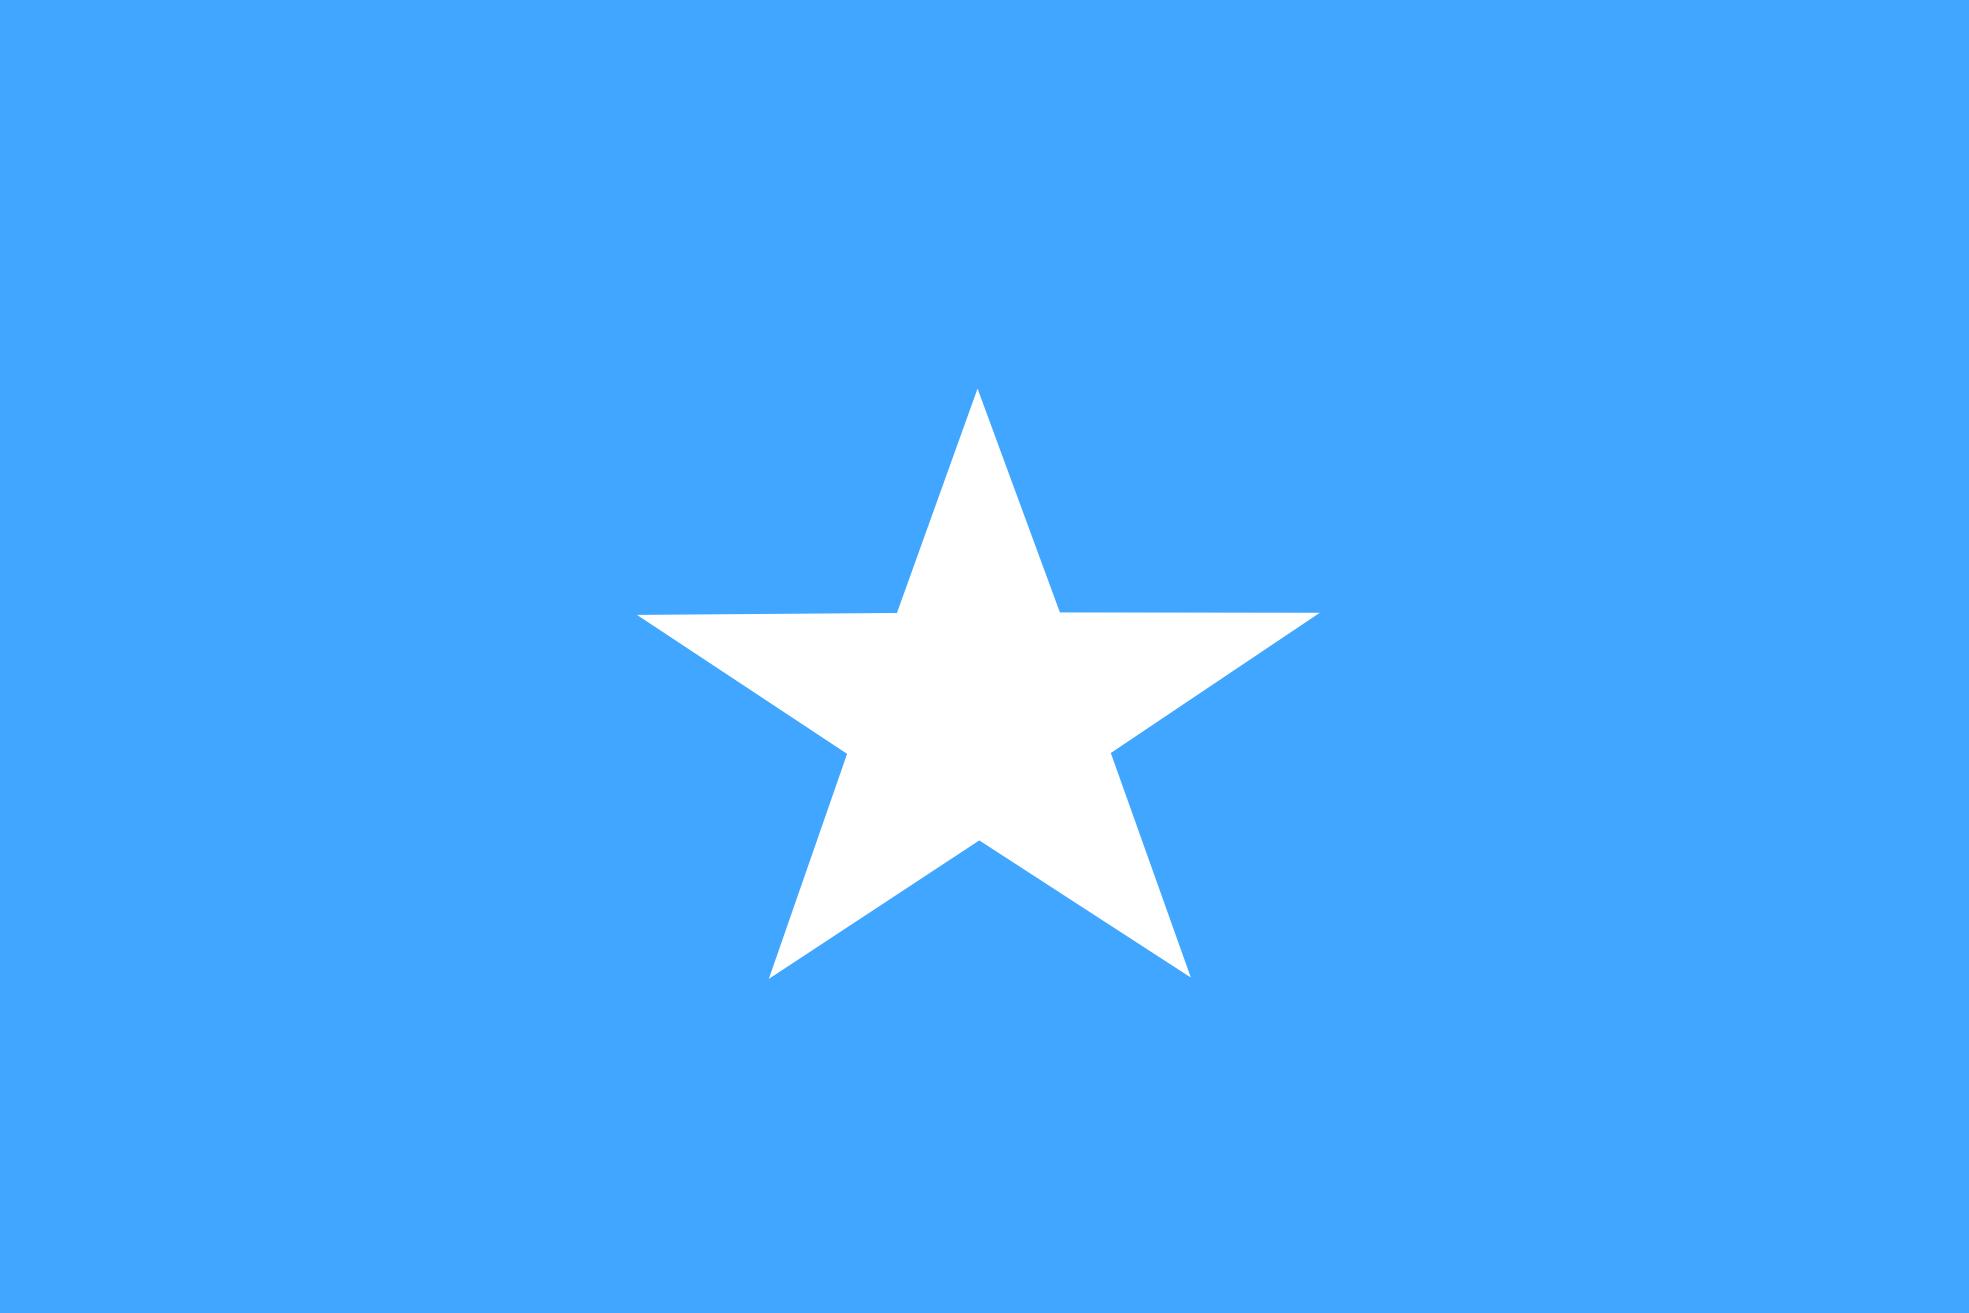 clip art somalia flag drapeau bandiera bandeira michigan clip art with upper peninsula michigan clip art vernors